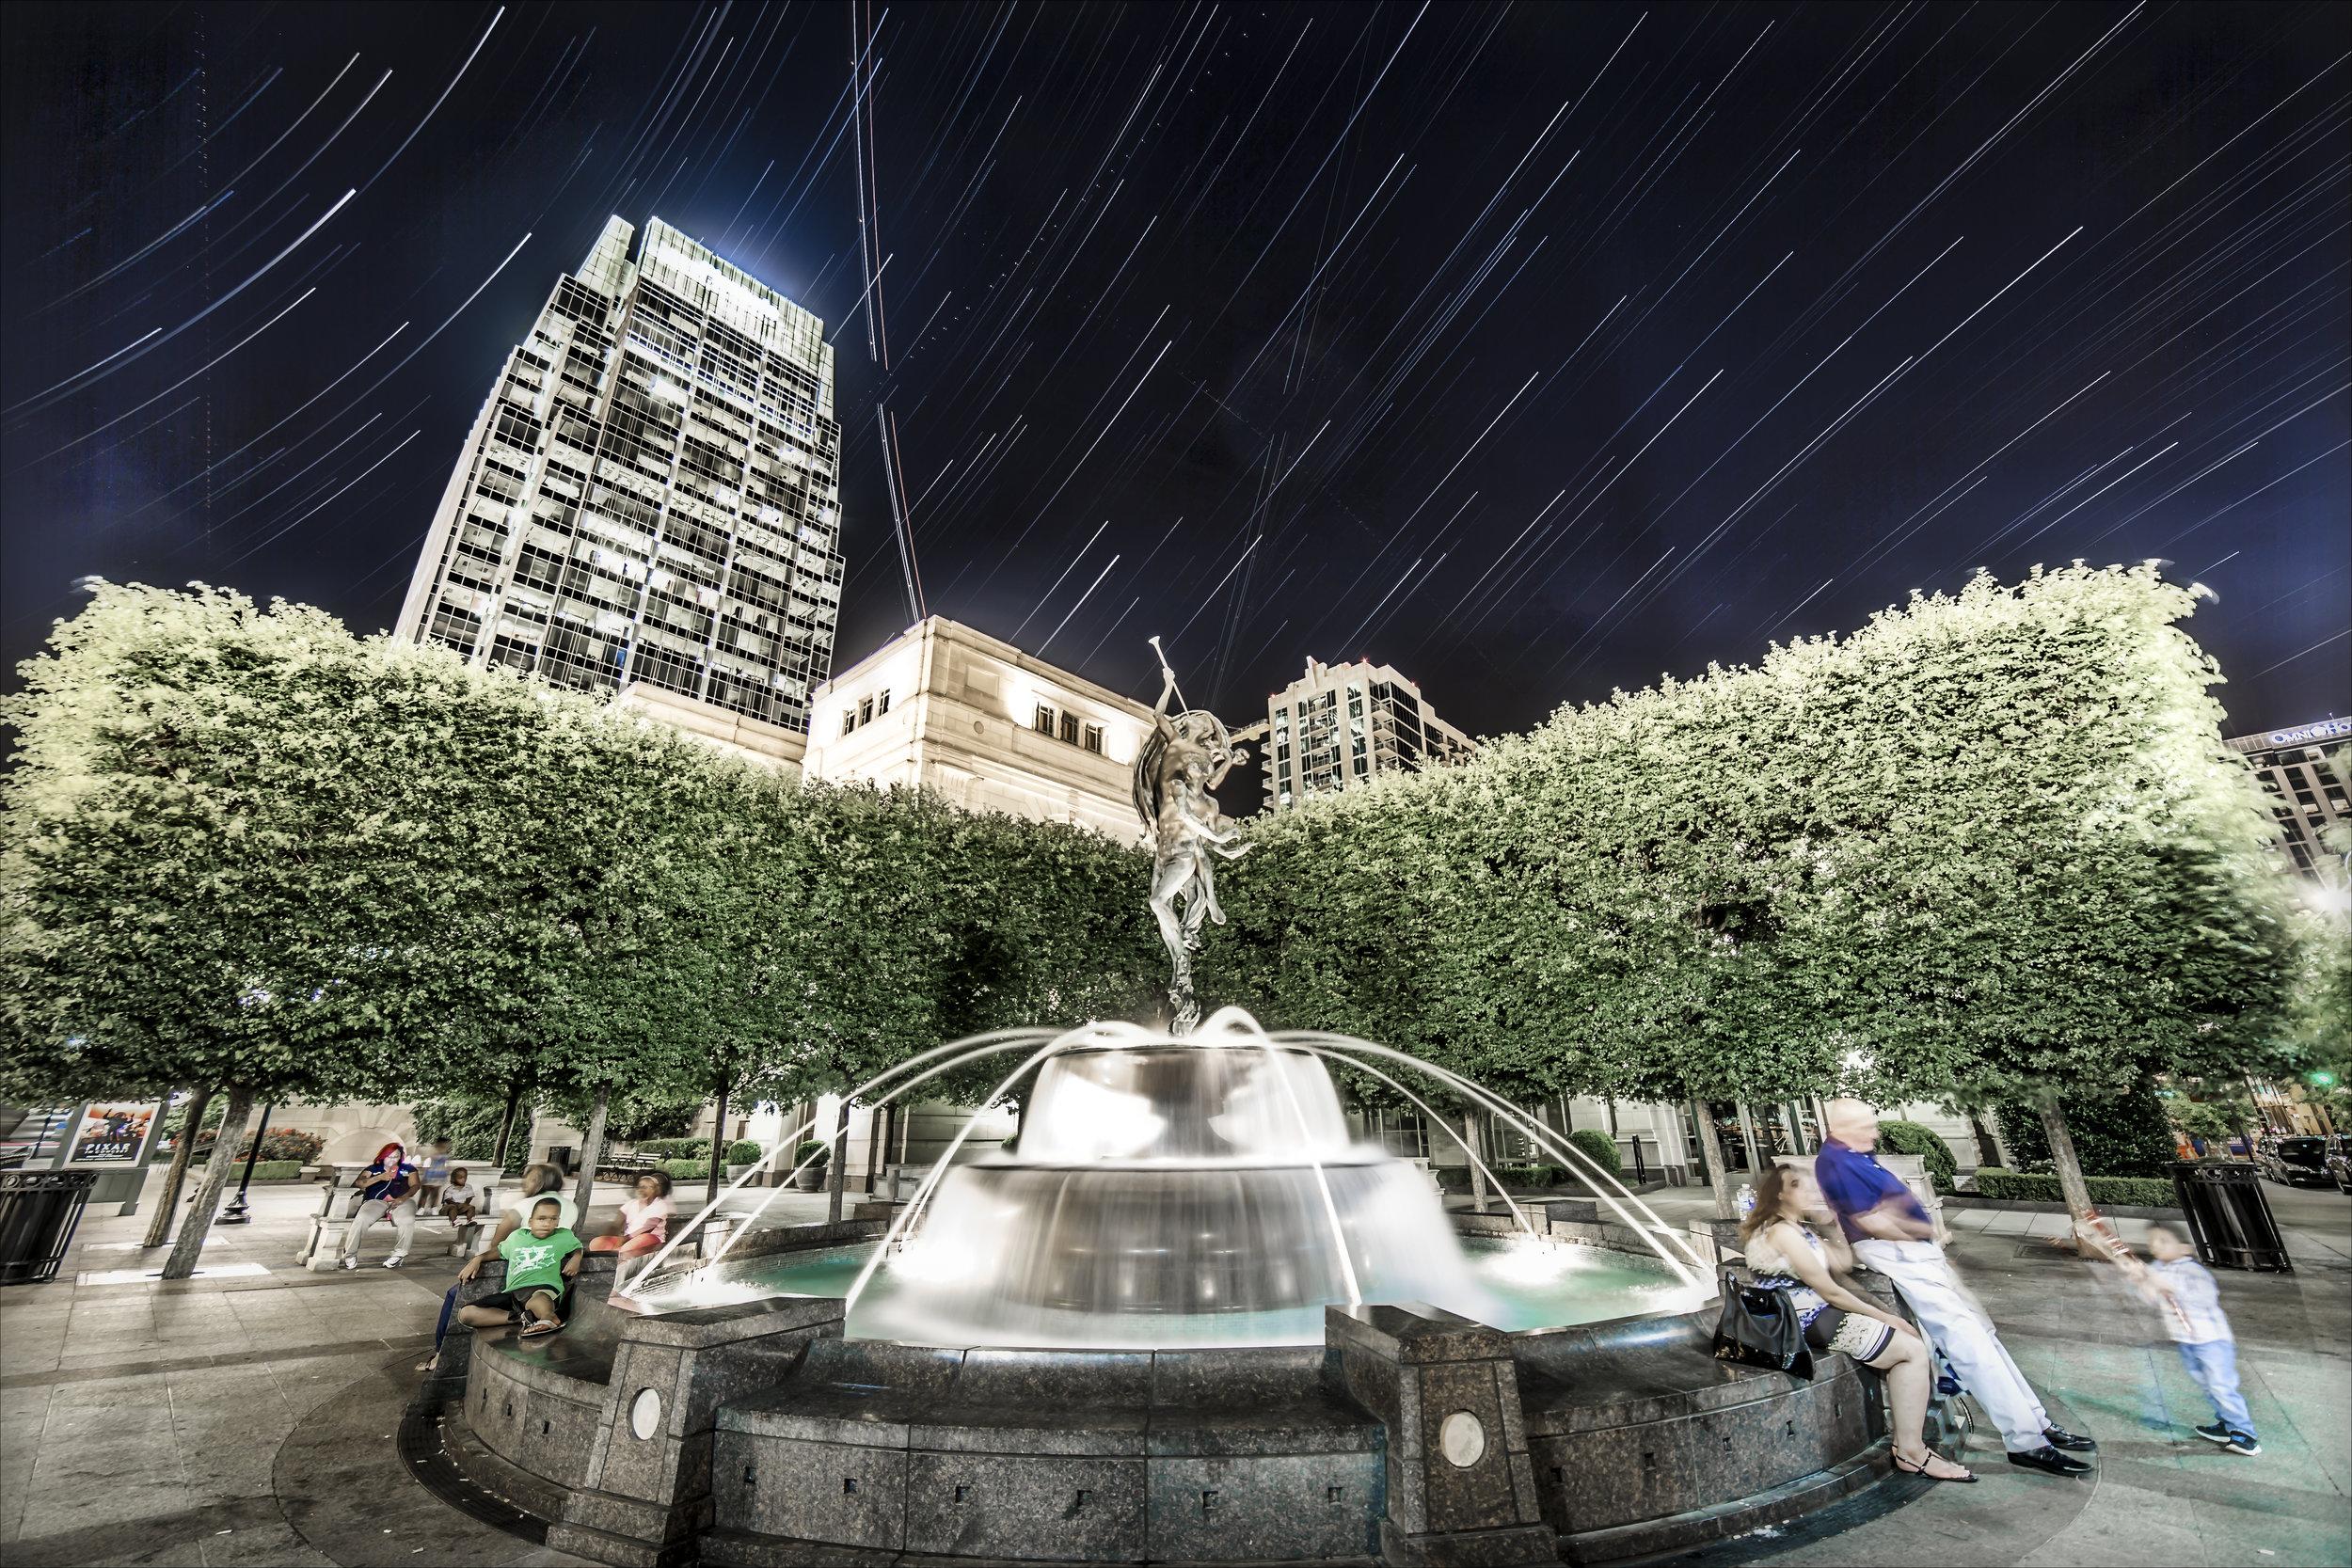 Symphony Fountain.00_00_02_06.Still003.jpg